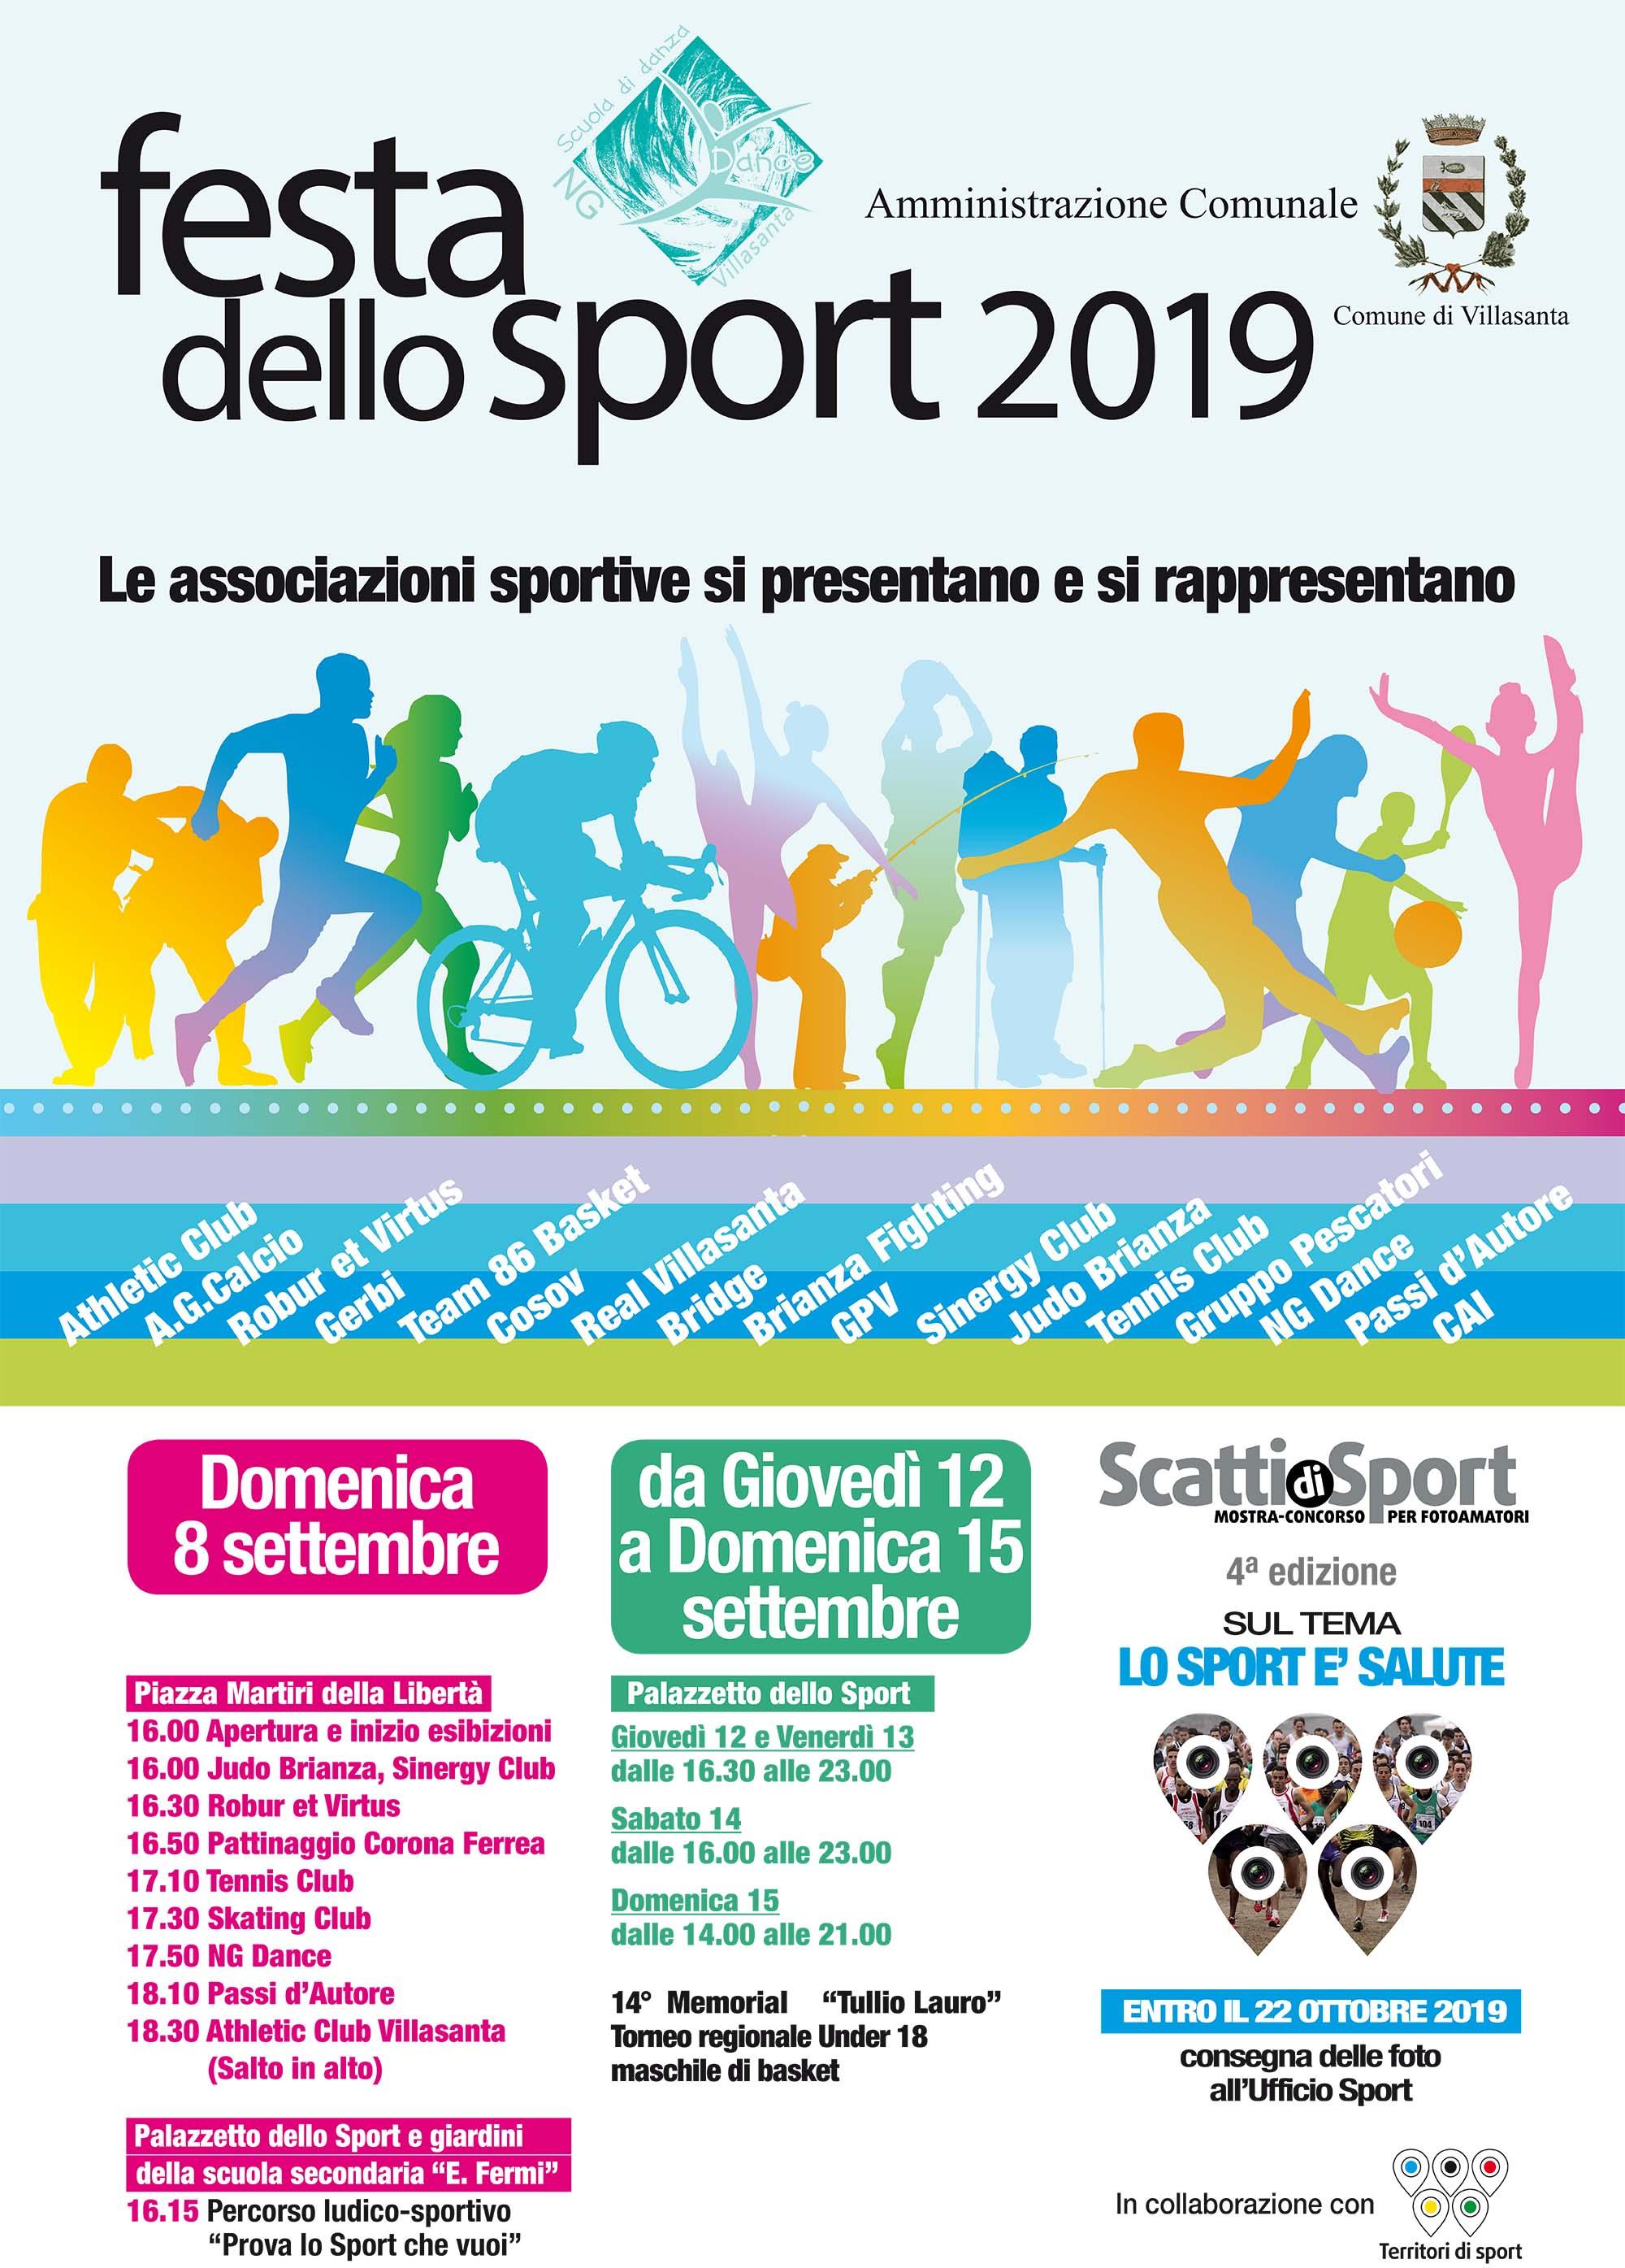 Festa dello sport 2019 ngdance